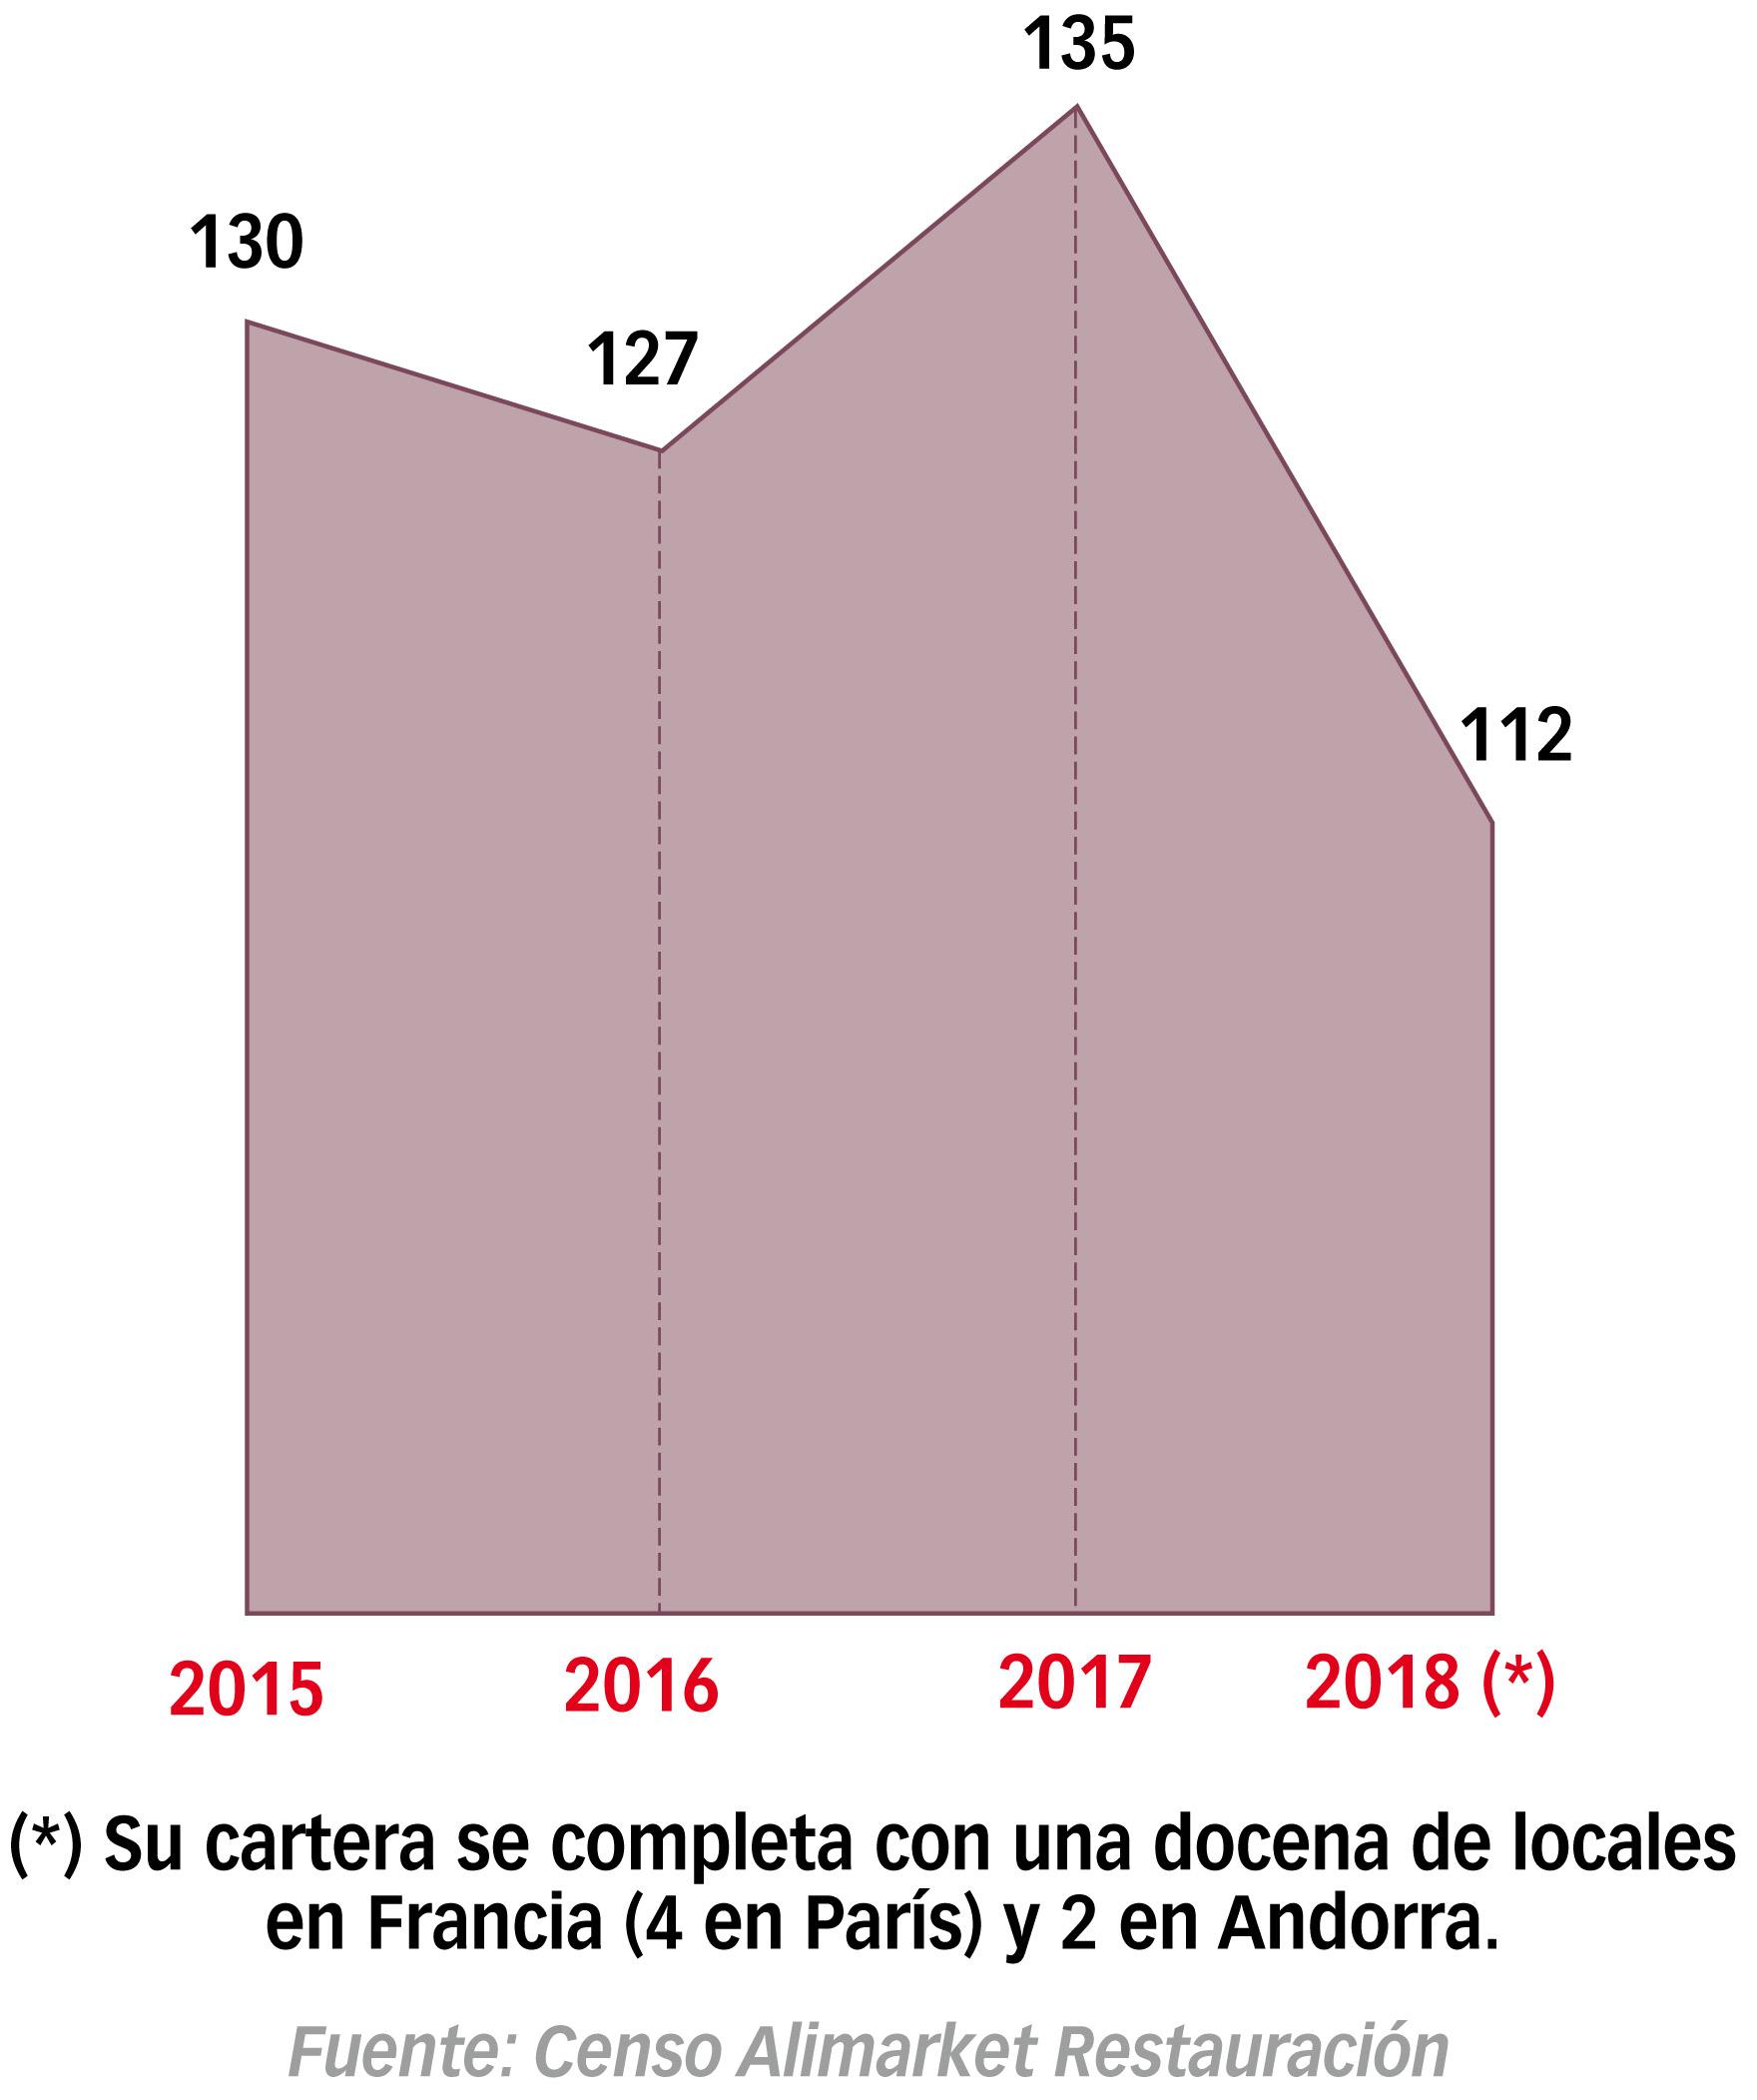 Evolución de locales 'Nostrum' en España